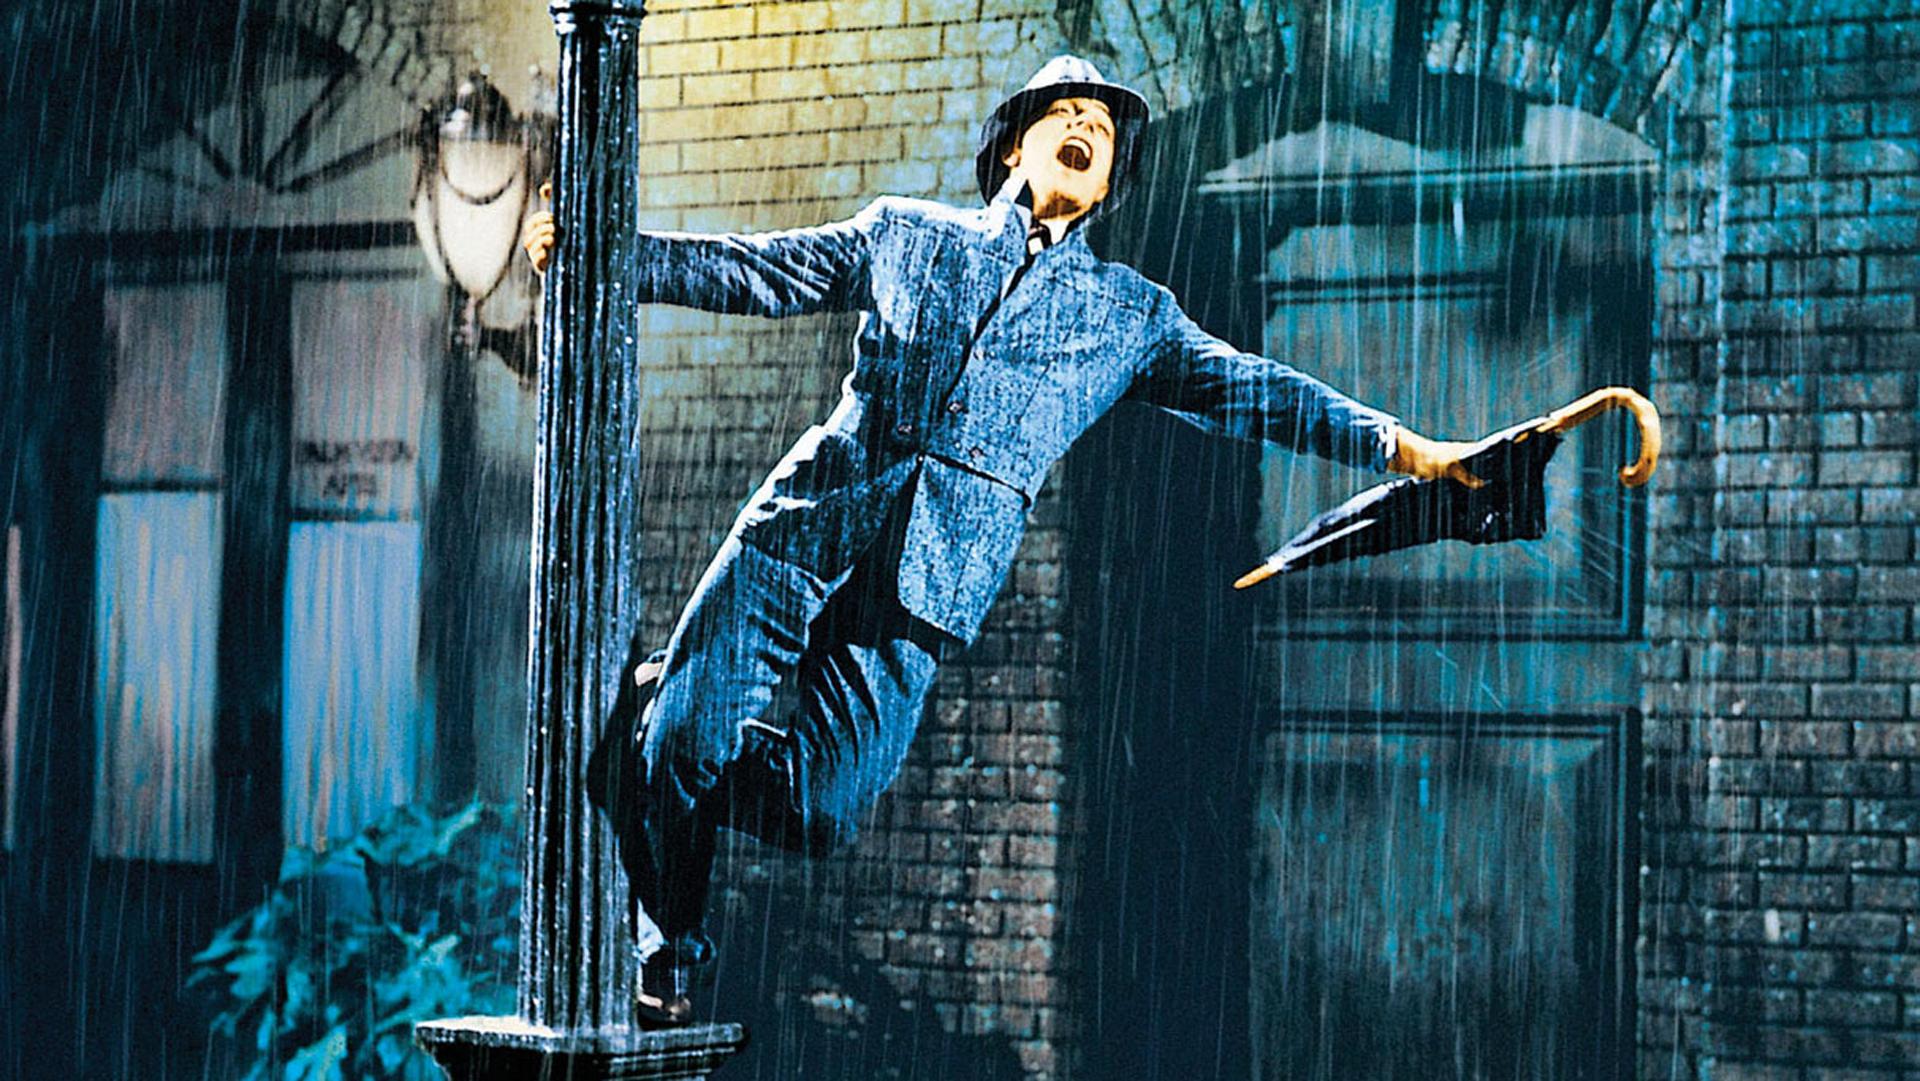 Top 250 фильмов IMDb Поющие под дождём (Singin' in the Rain) (1952)